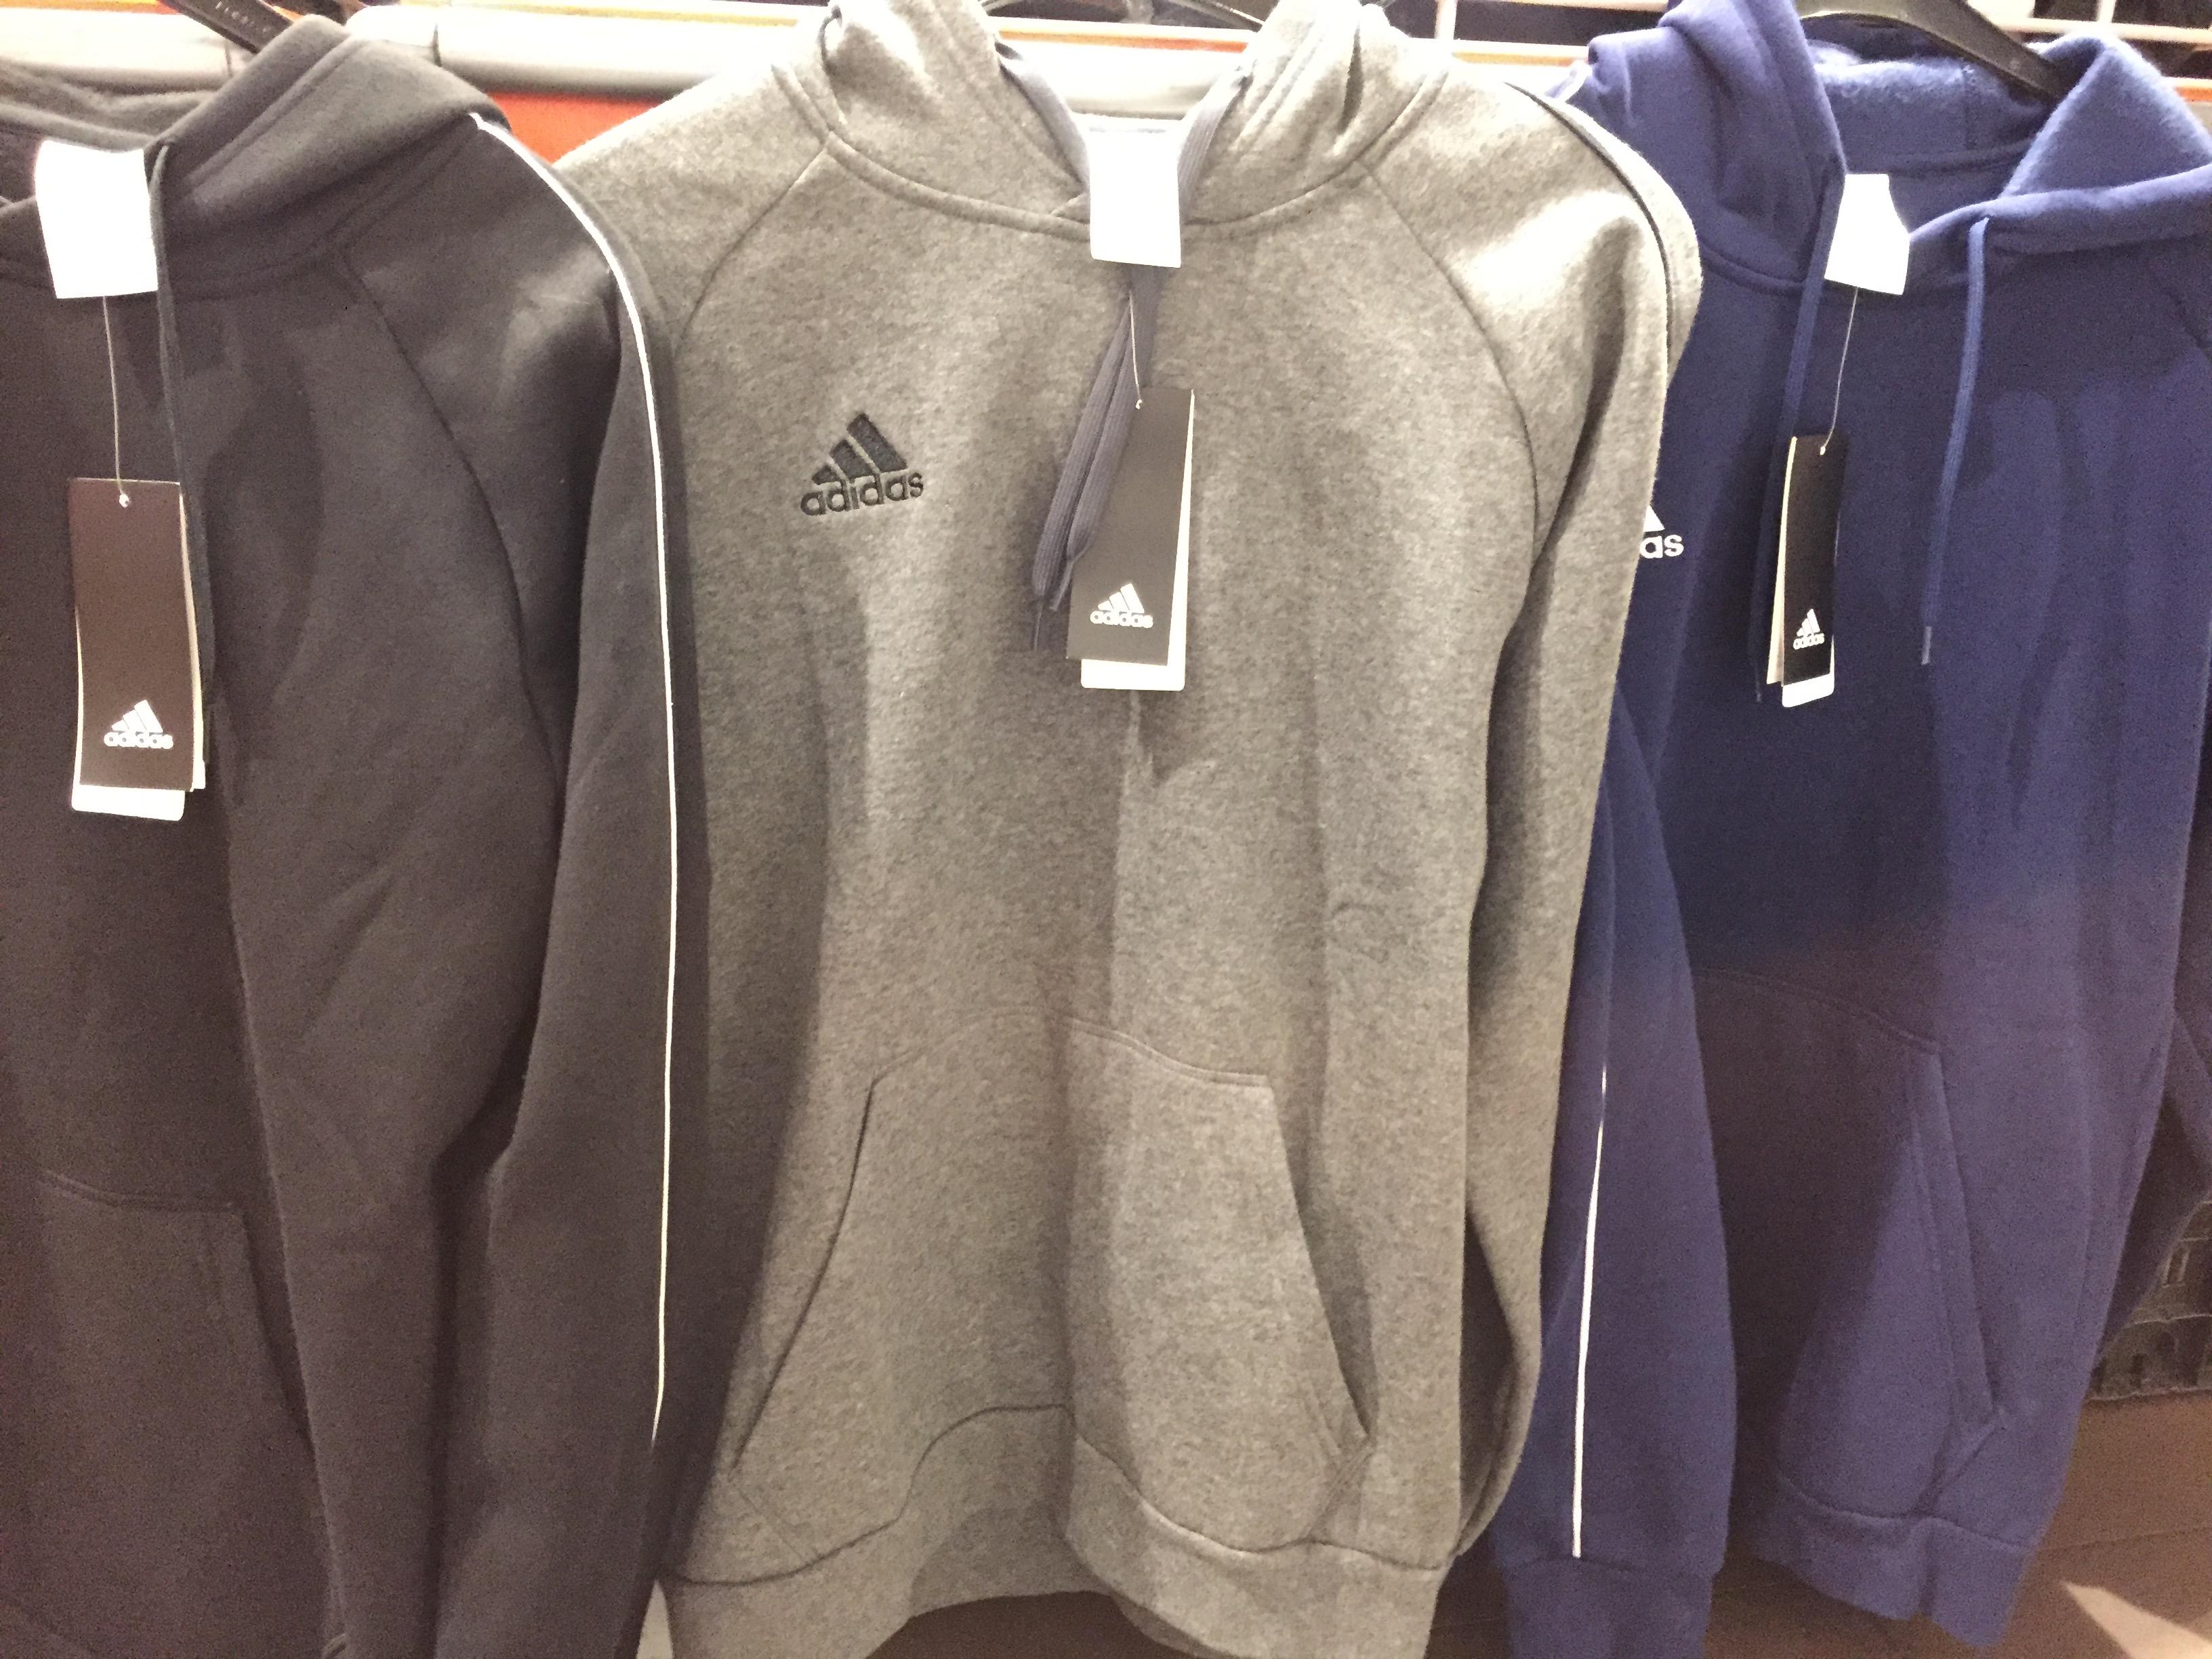 Adidas truien en broeken AH mathenesserplein